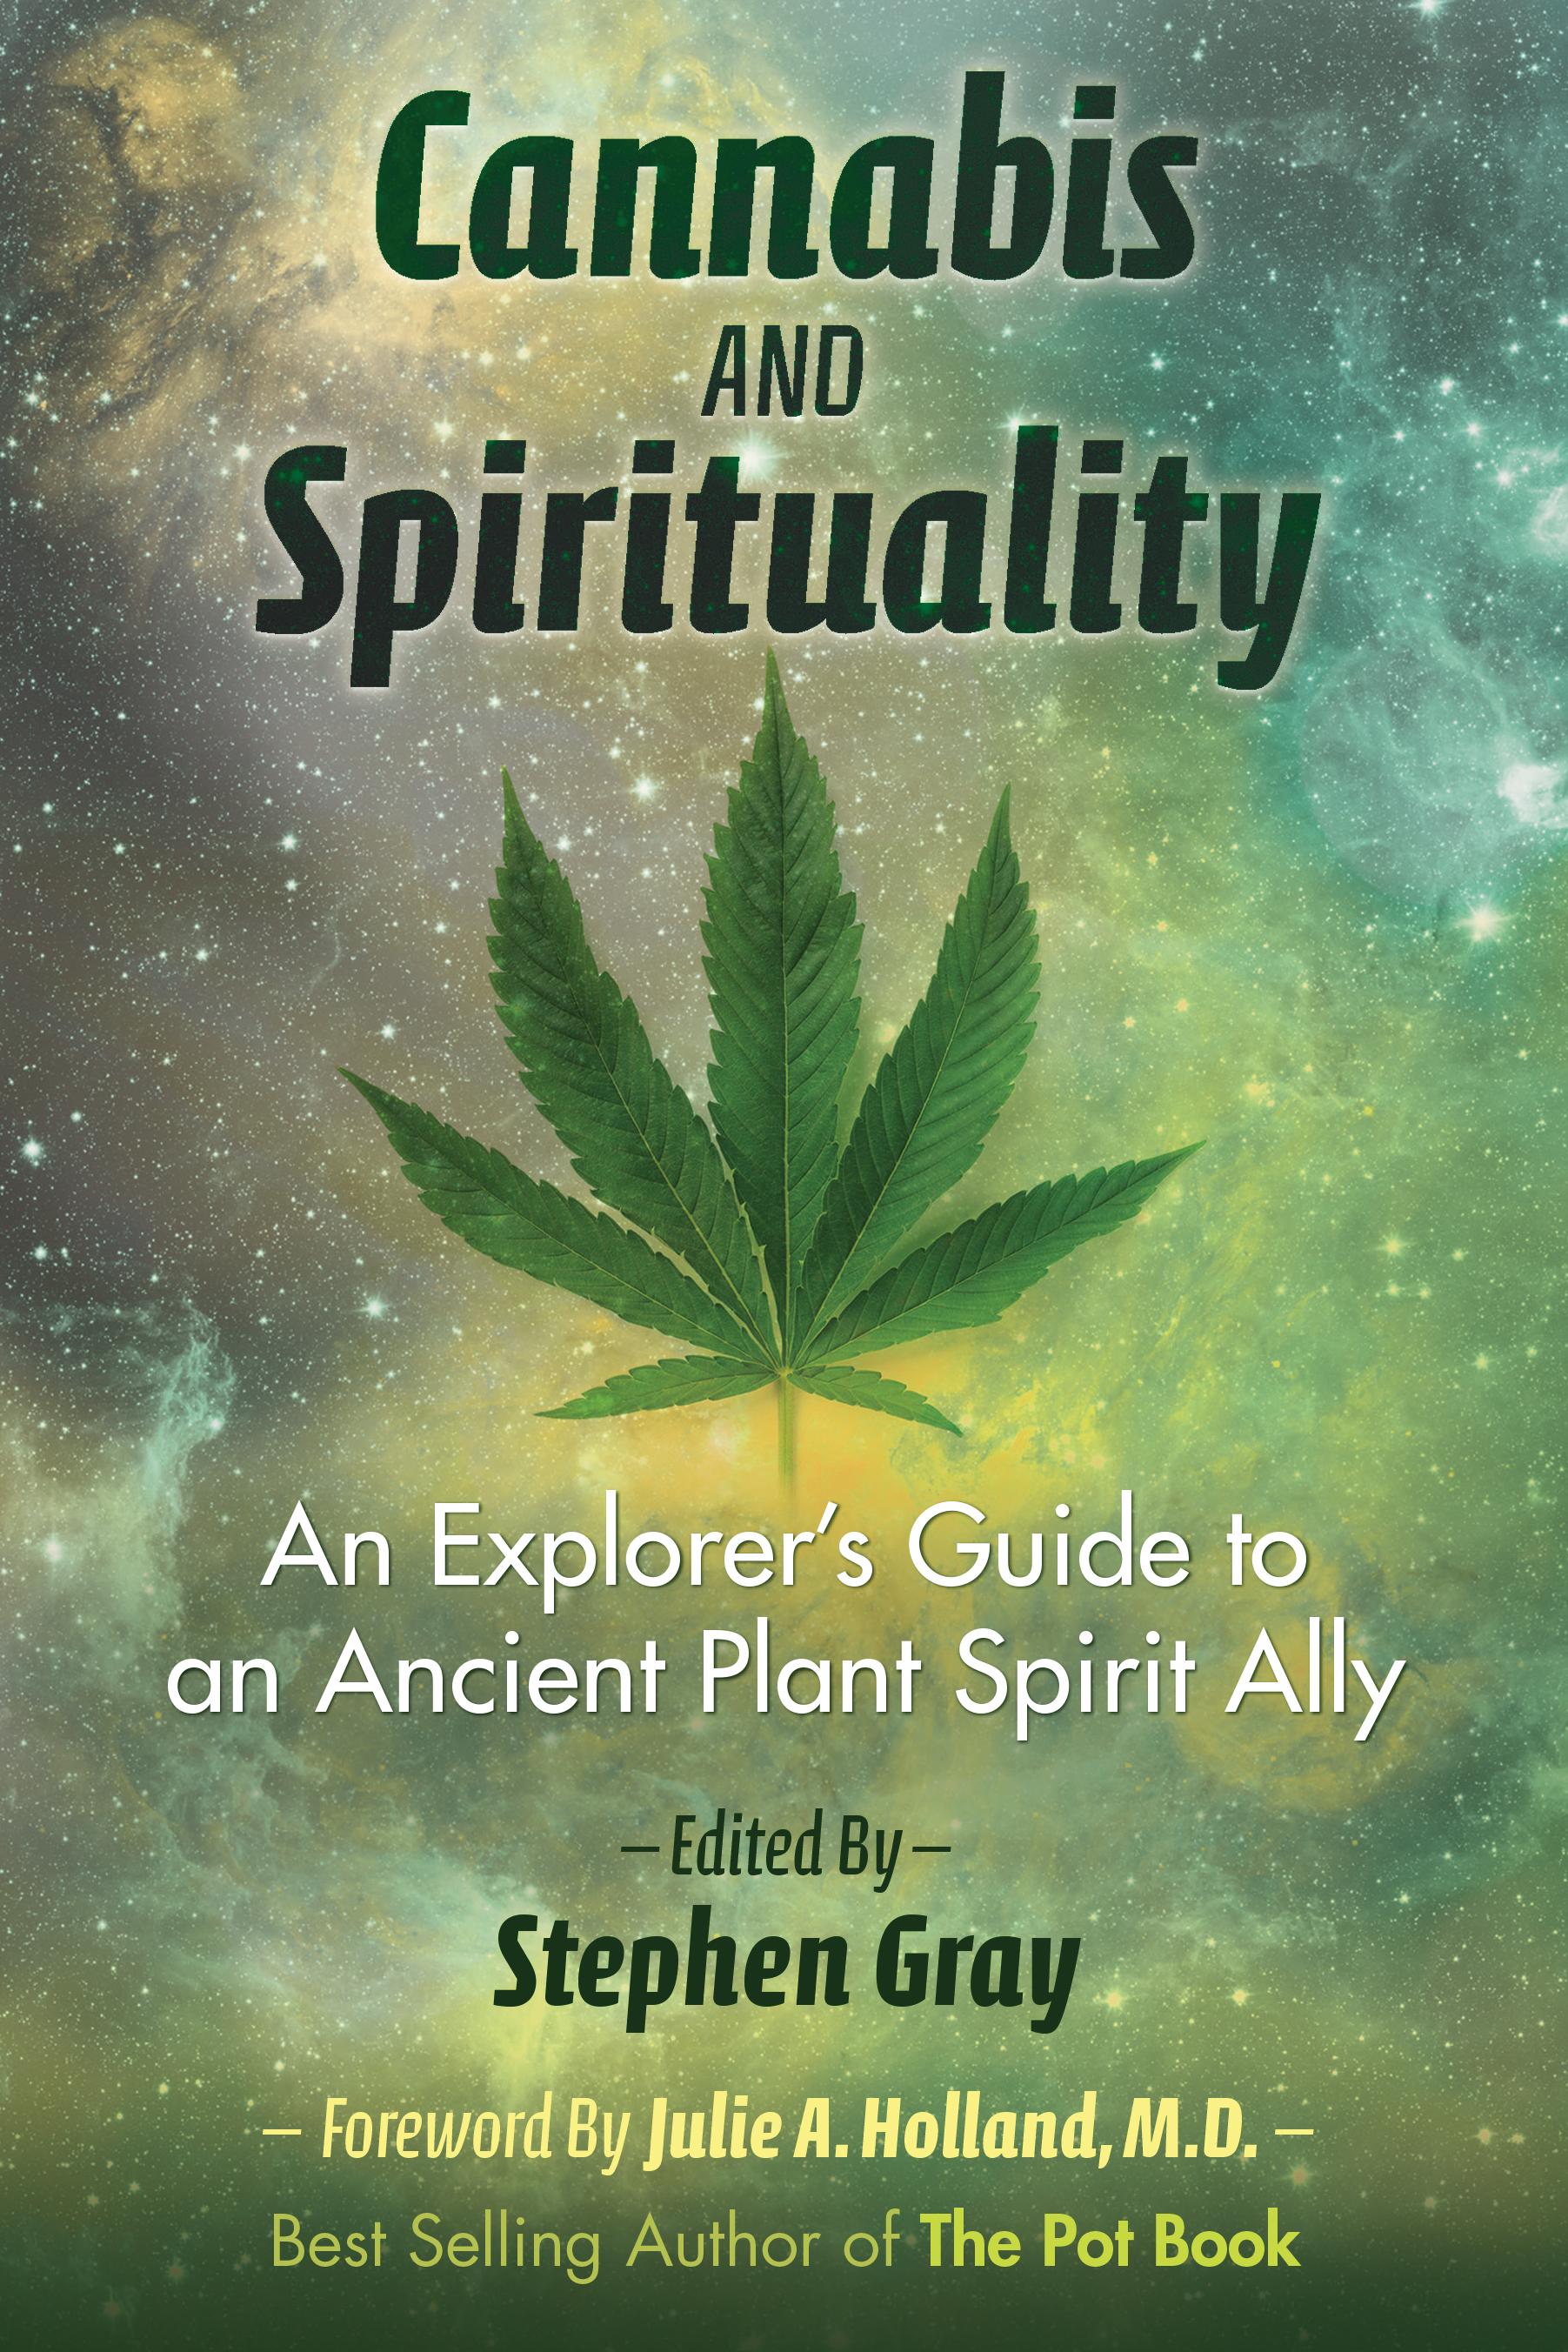 Caption: Cannabis and Spirituality, Credit: Stephen Gray